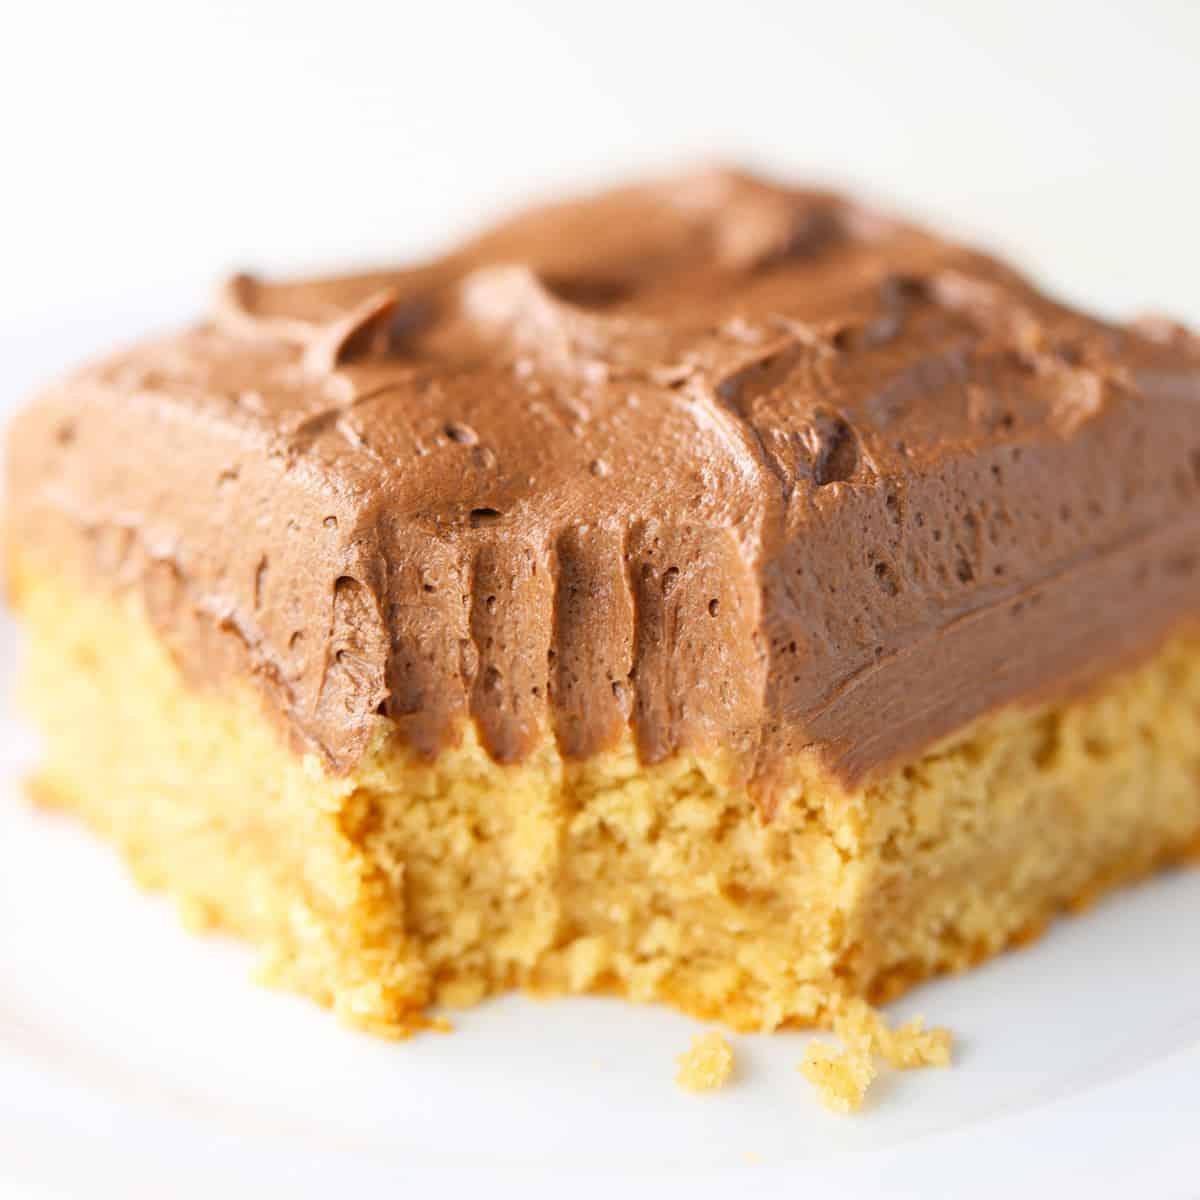 Peanut-Butter-Buckeye-Bars-4-SQ